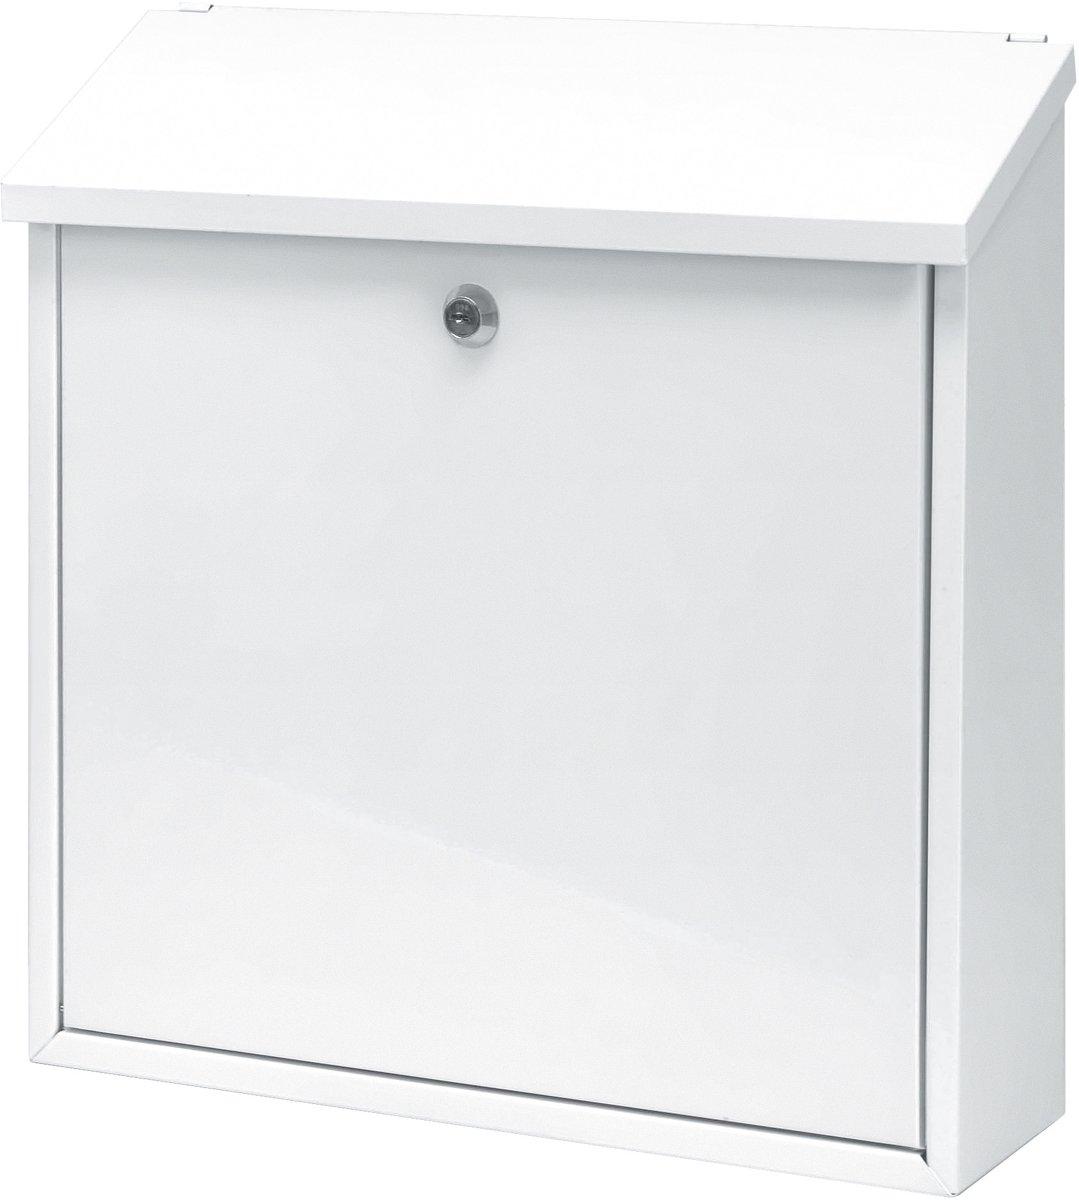 Stalen brievenbus wit - 11,5x37x37 cm